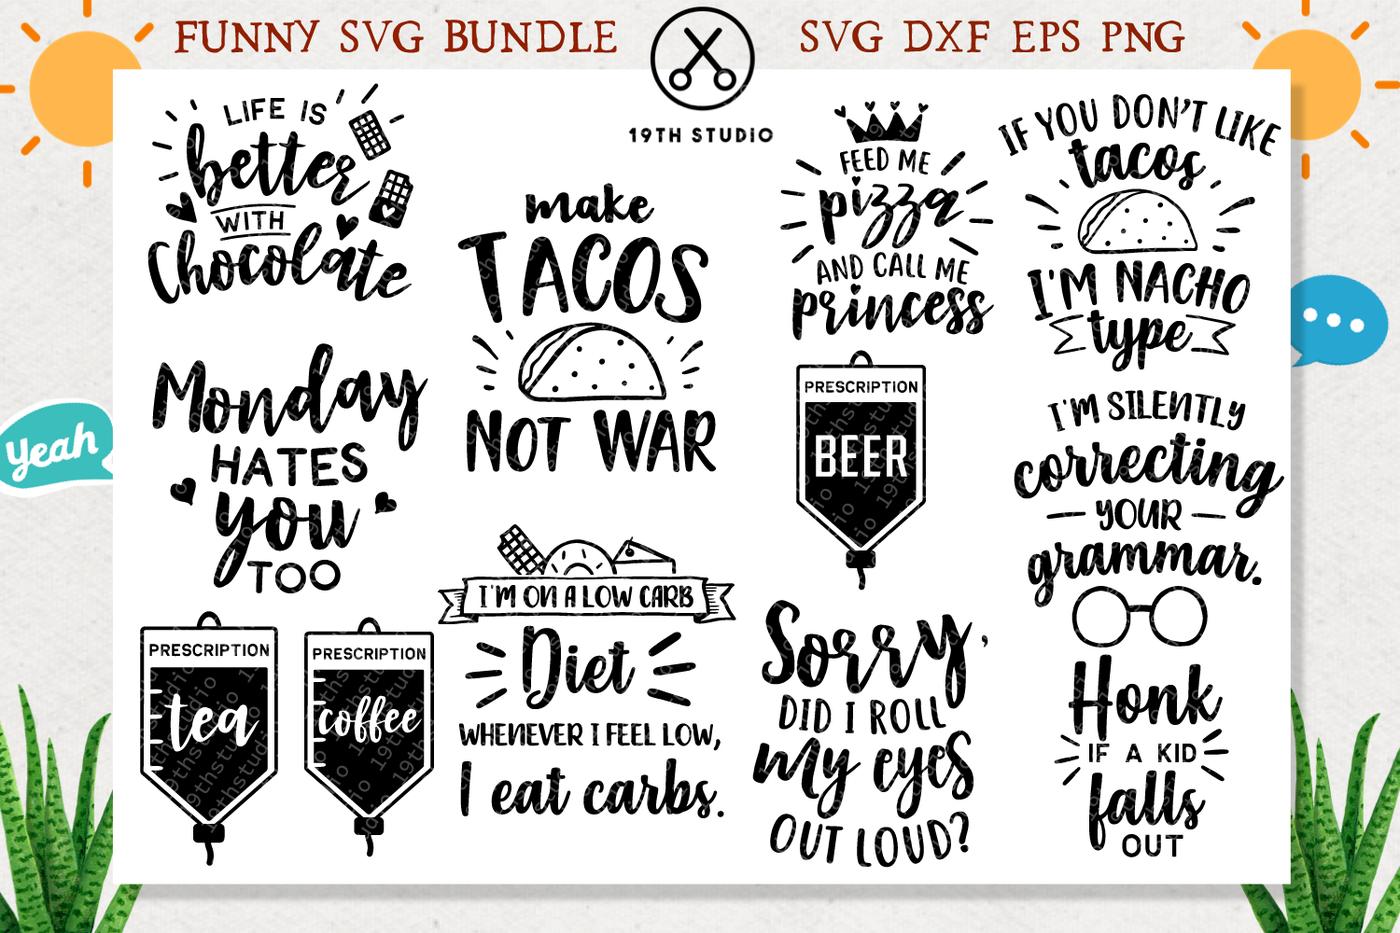 Funny Svg Bundle Svg Dxf Eps Png M4 By 19th Studio